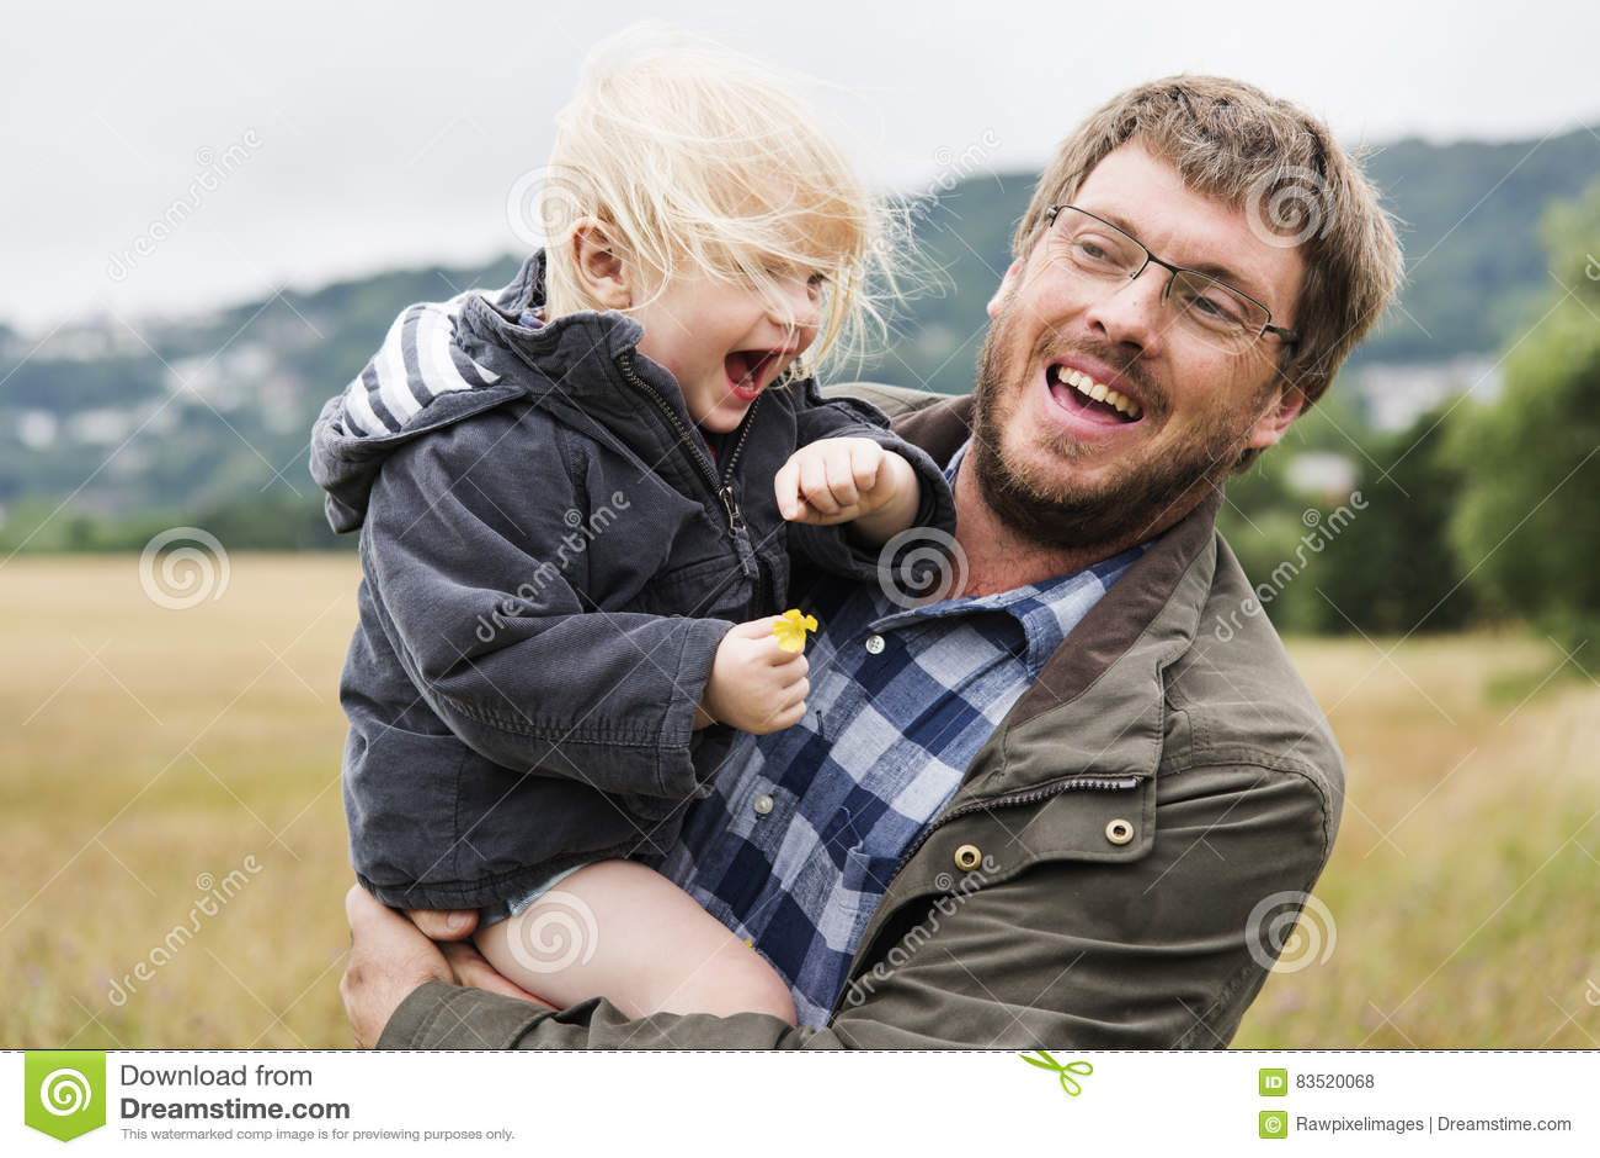 Padre Son Smiling Togetherness de la familia al aire libre que lleva concepto